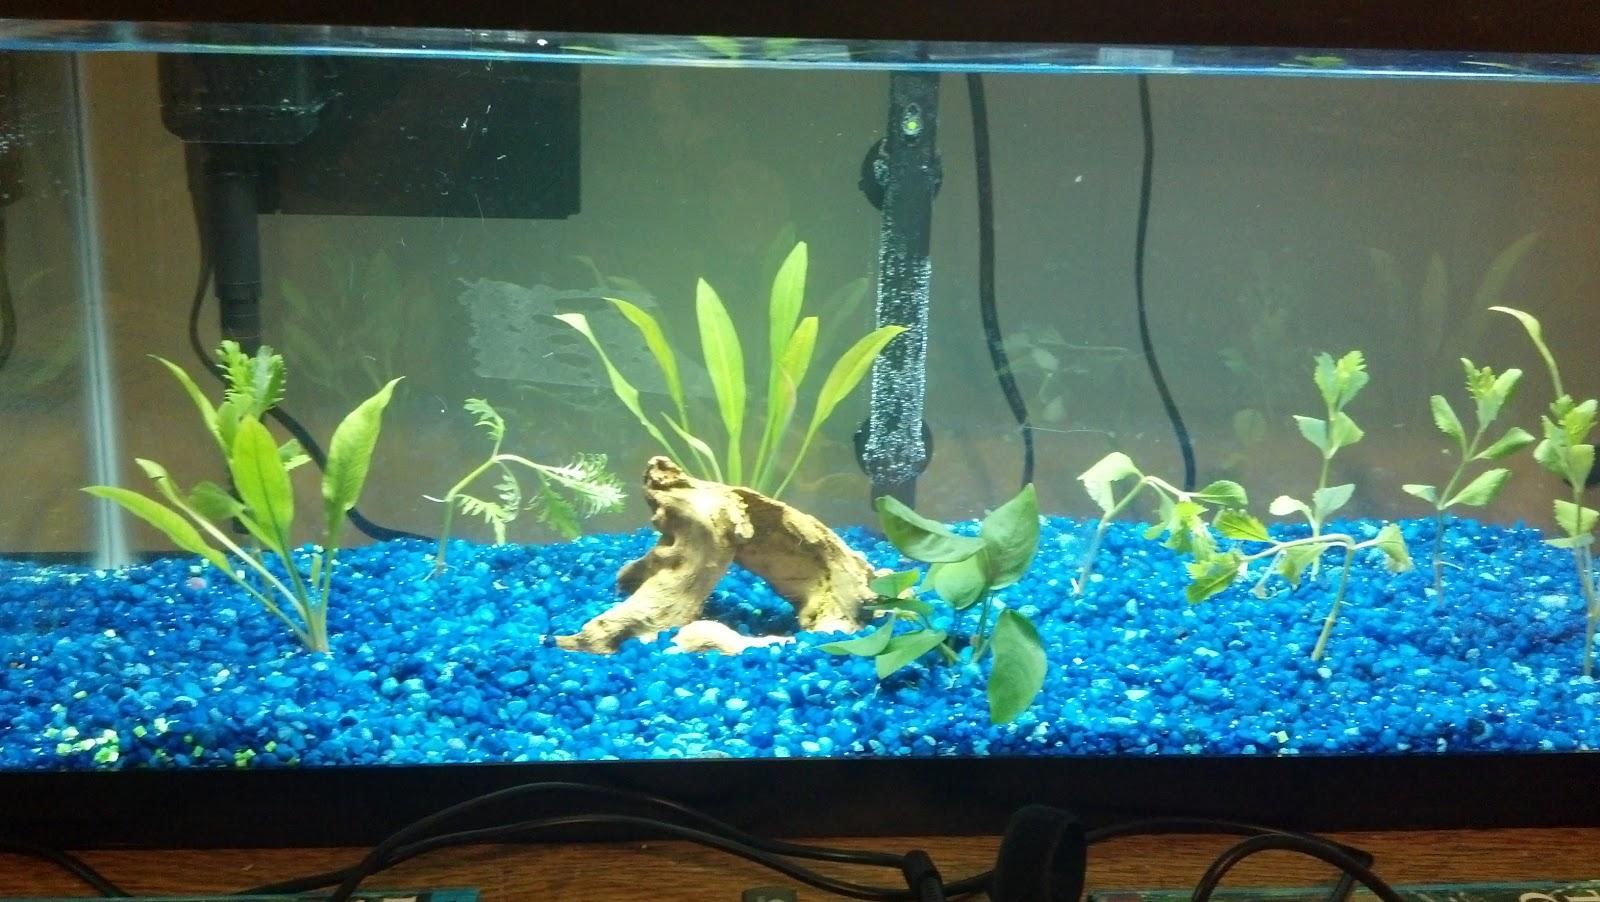 20 gallon aquarium craigslist 106 kb jpeg fish tank for for Freshwater fish for 20 gallon tank